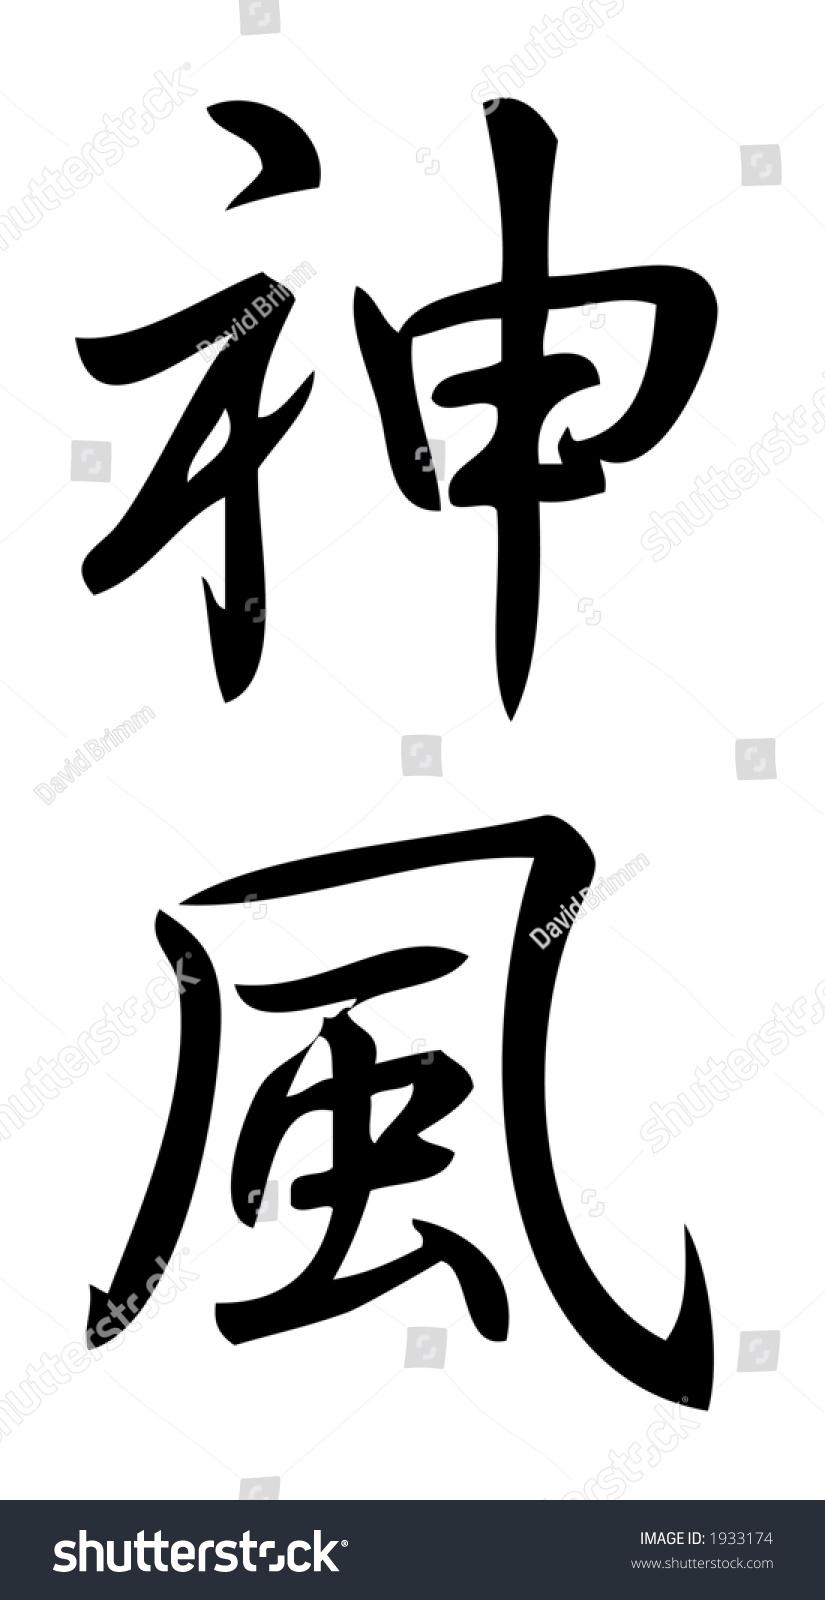 Kanji character kamikaze kanji one three stock illustration kanji character for kamikaze kanji one of three scripts used in the japanese language biocorpaavc